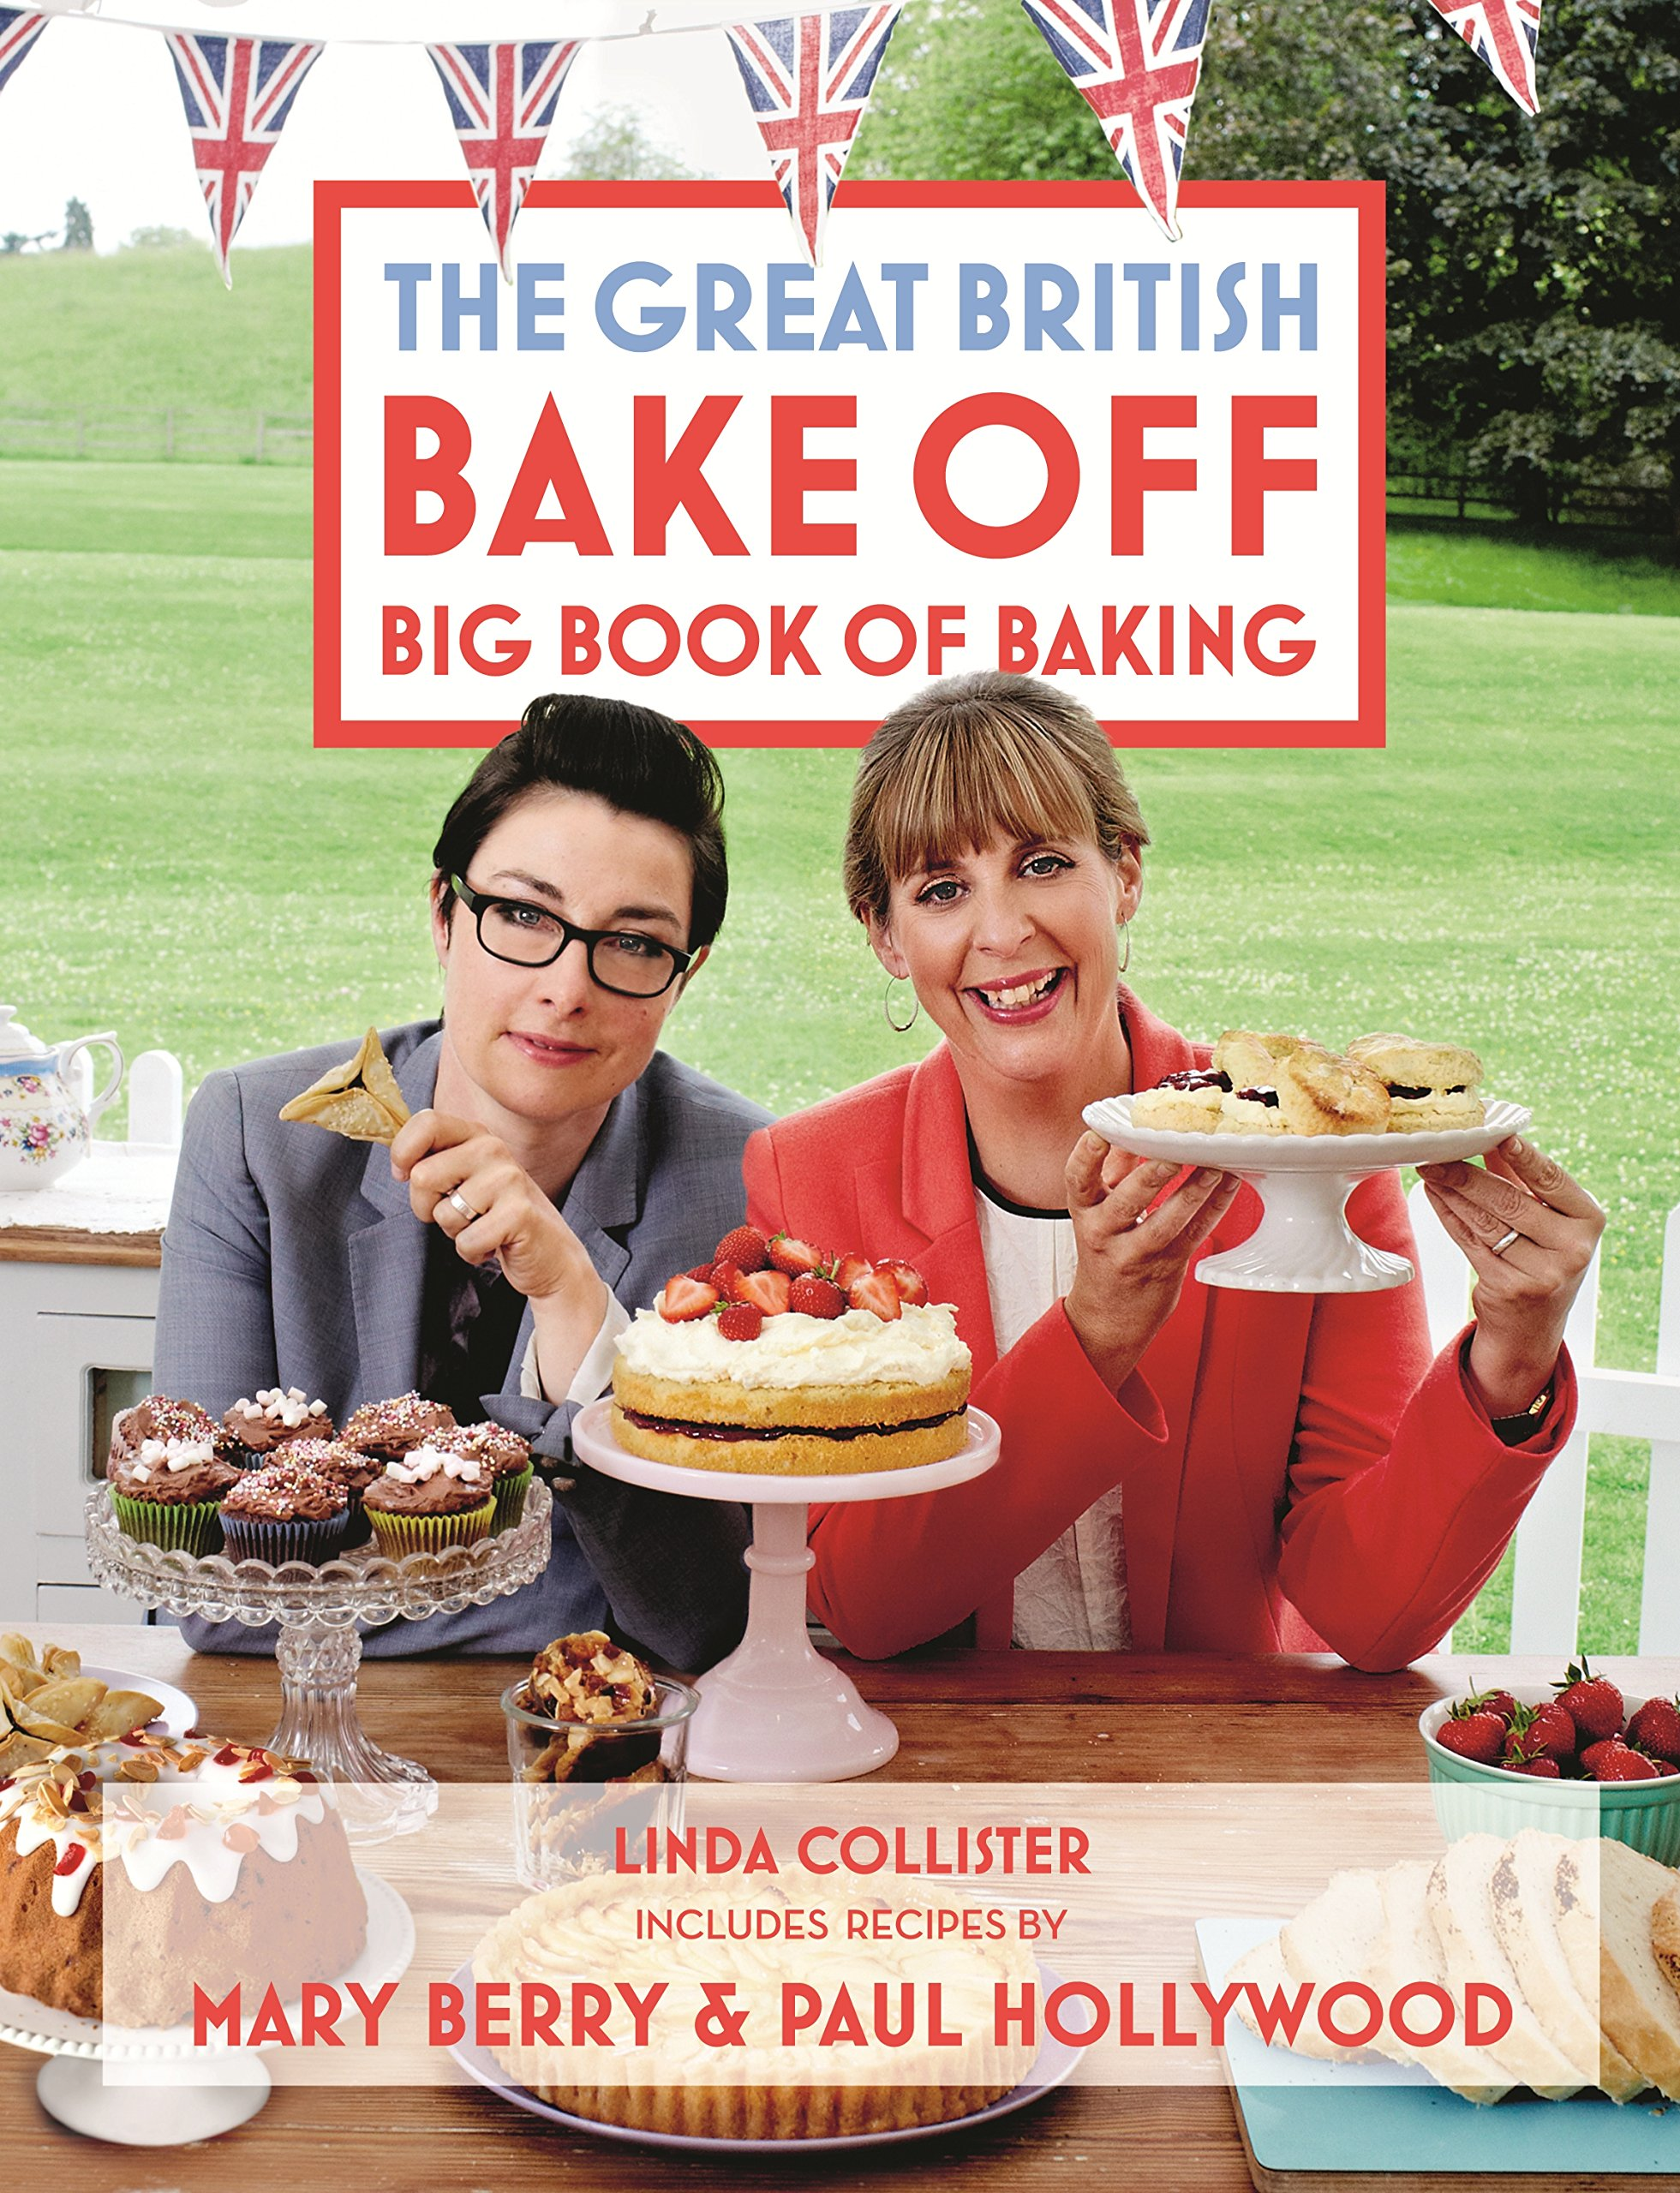 Great British Bake Book Baking product image